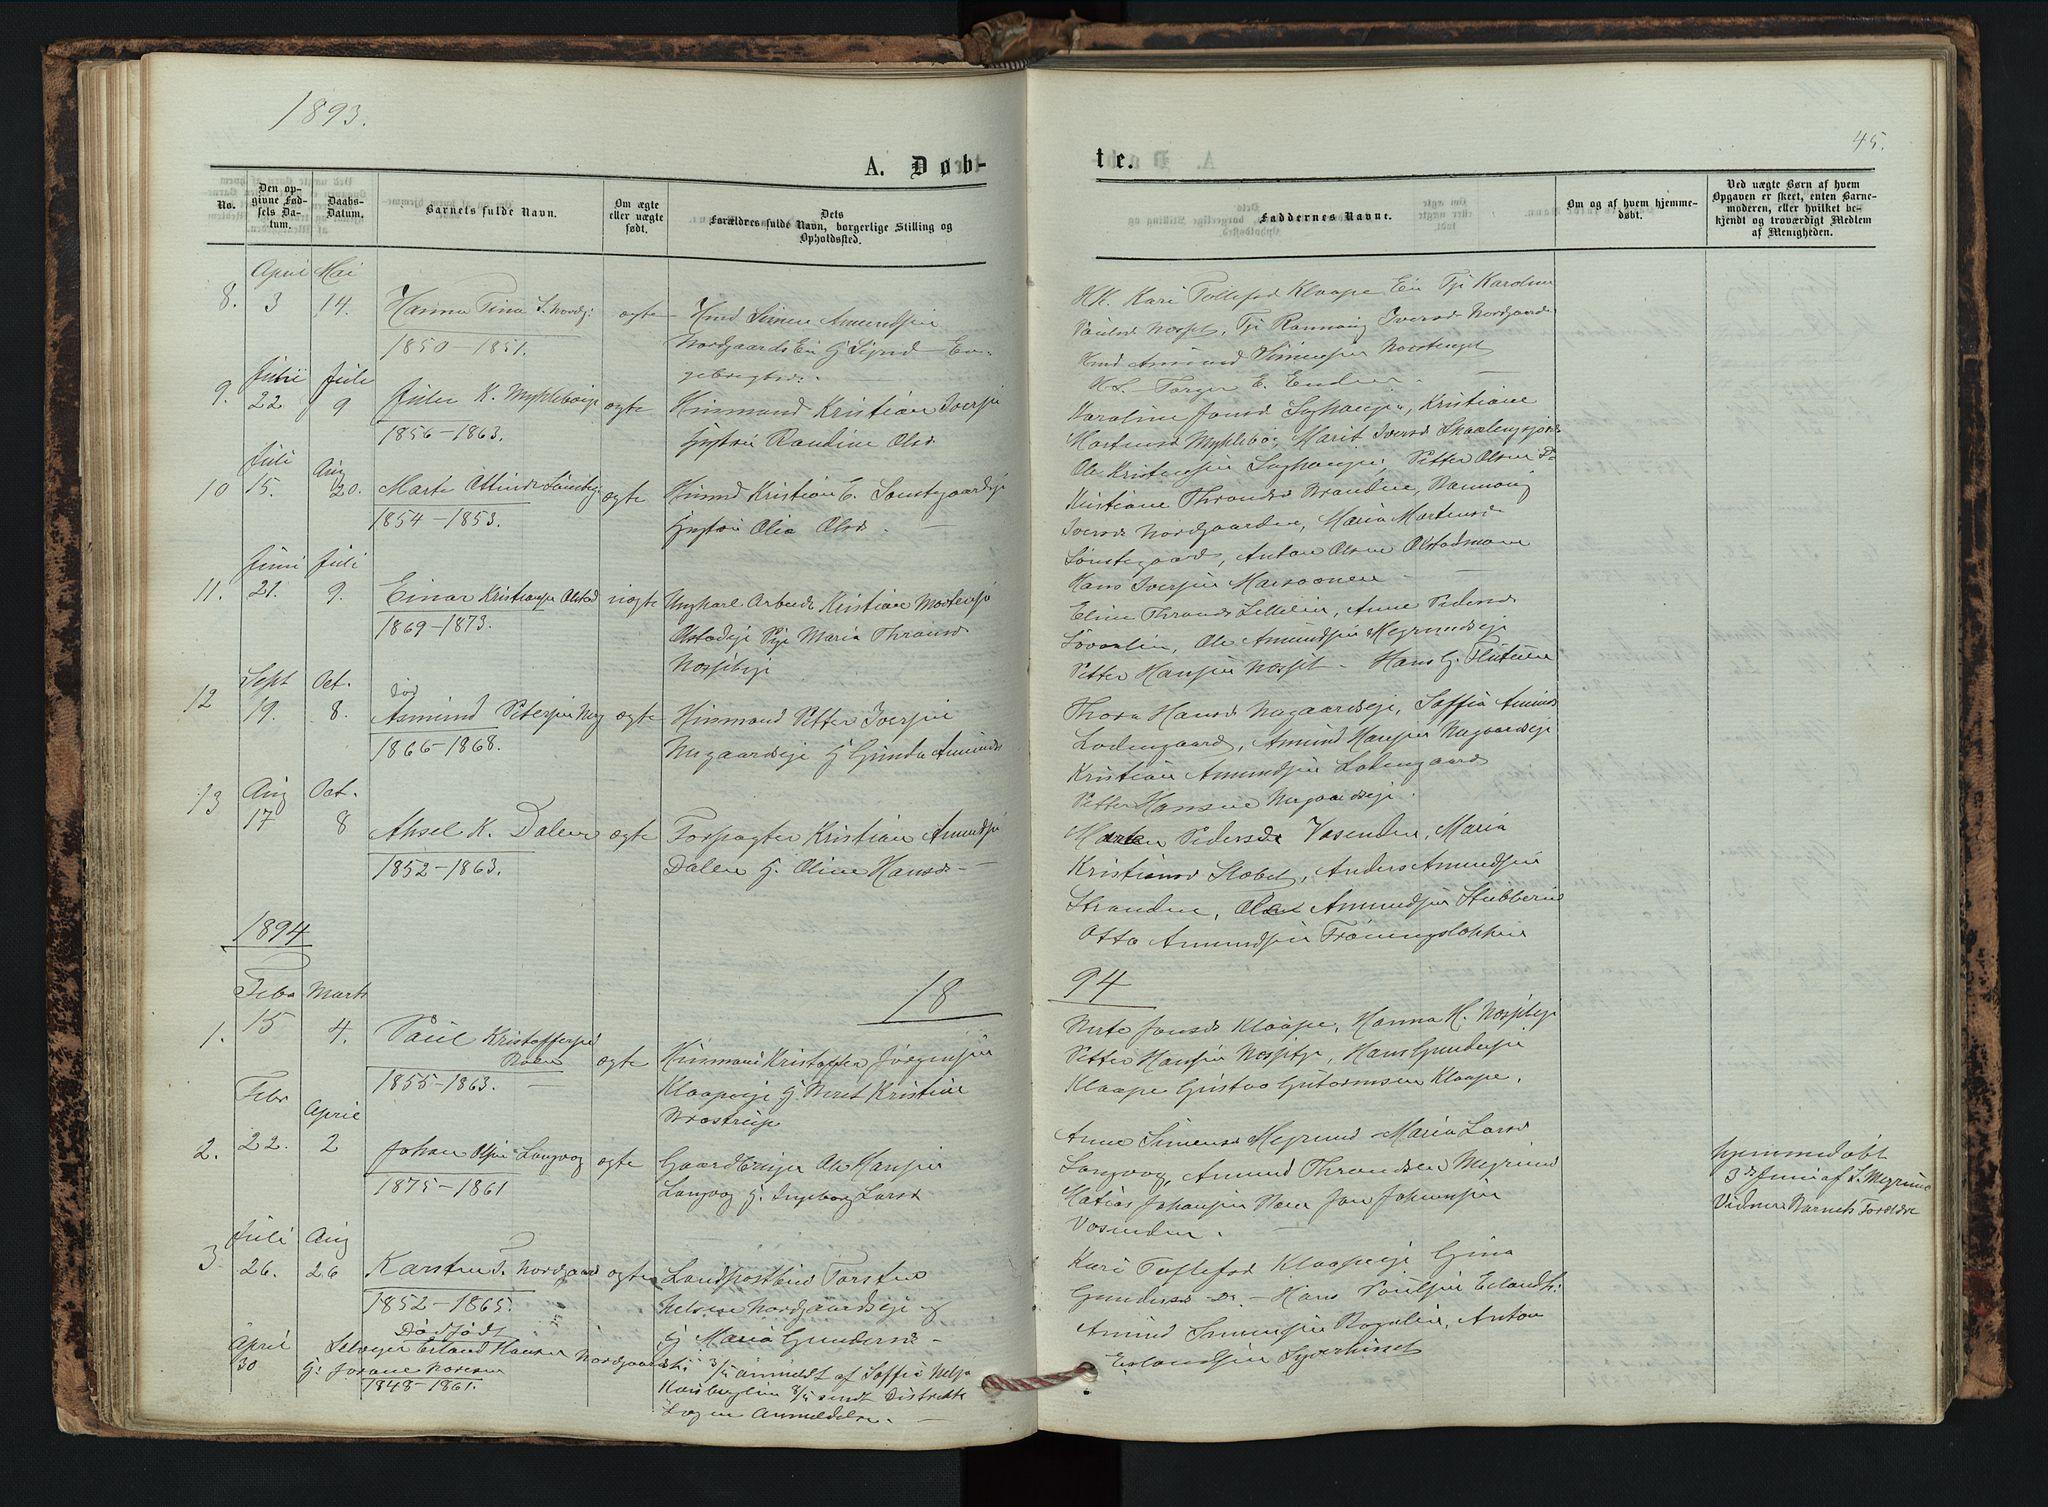 SAH, Vestre Gausdal prestekontor, Klokkerbok nr. 2, 1874-1897, s. 45